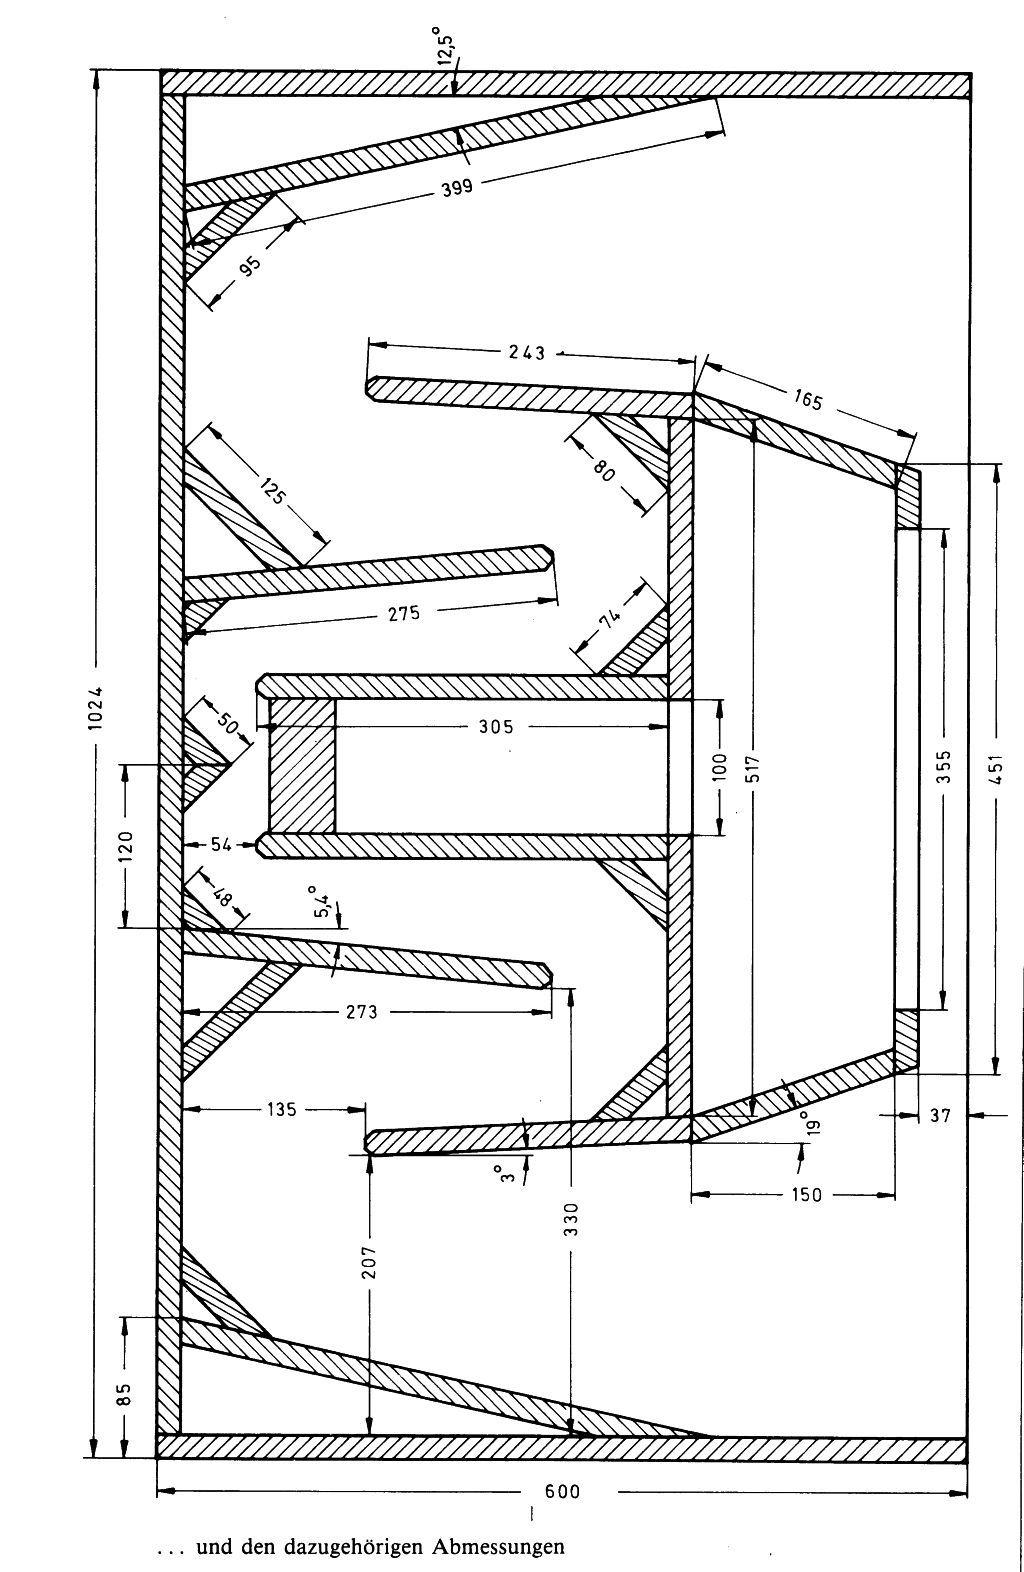 Attachmentphp 10241572 Pixels Loudspeaker Speaker Plans Tags Subwoofer Circuit Tda2030 Pcb Layout